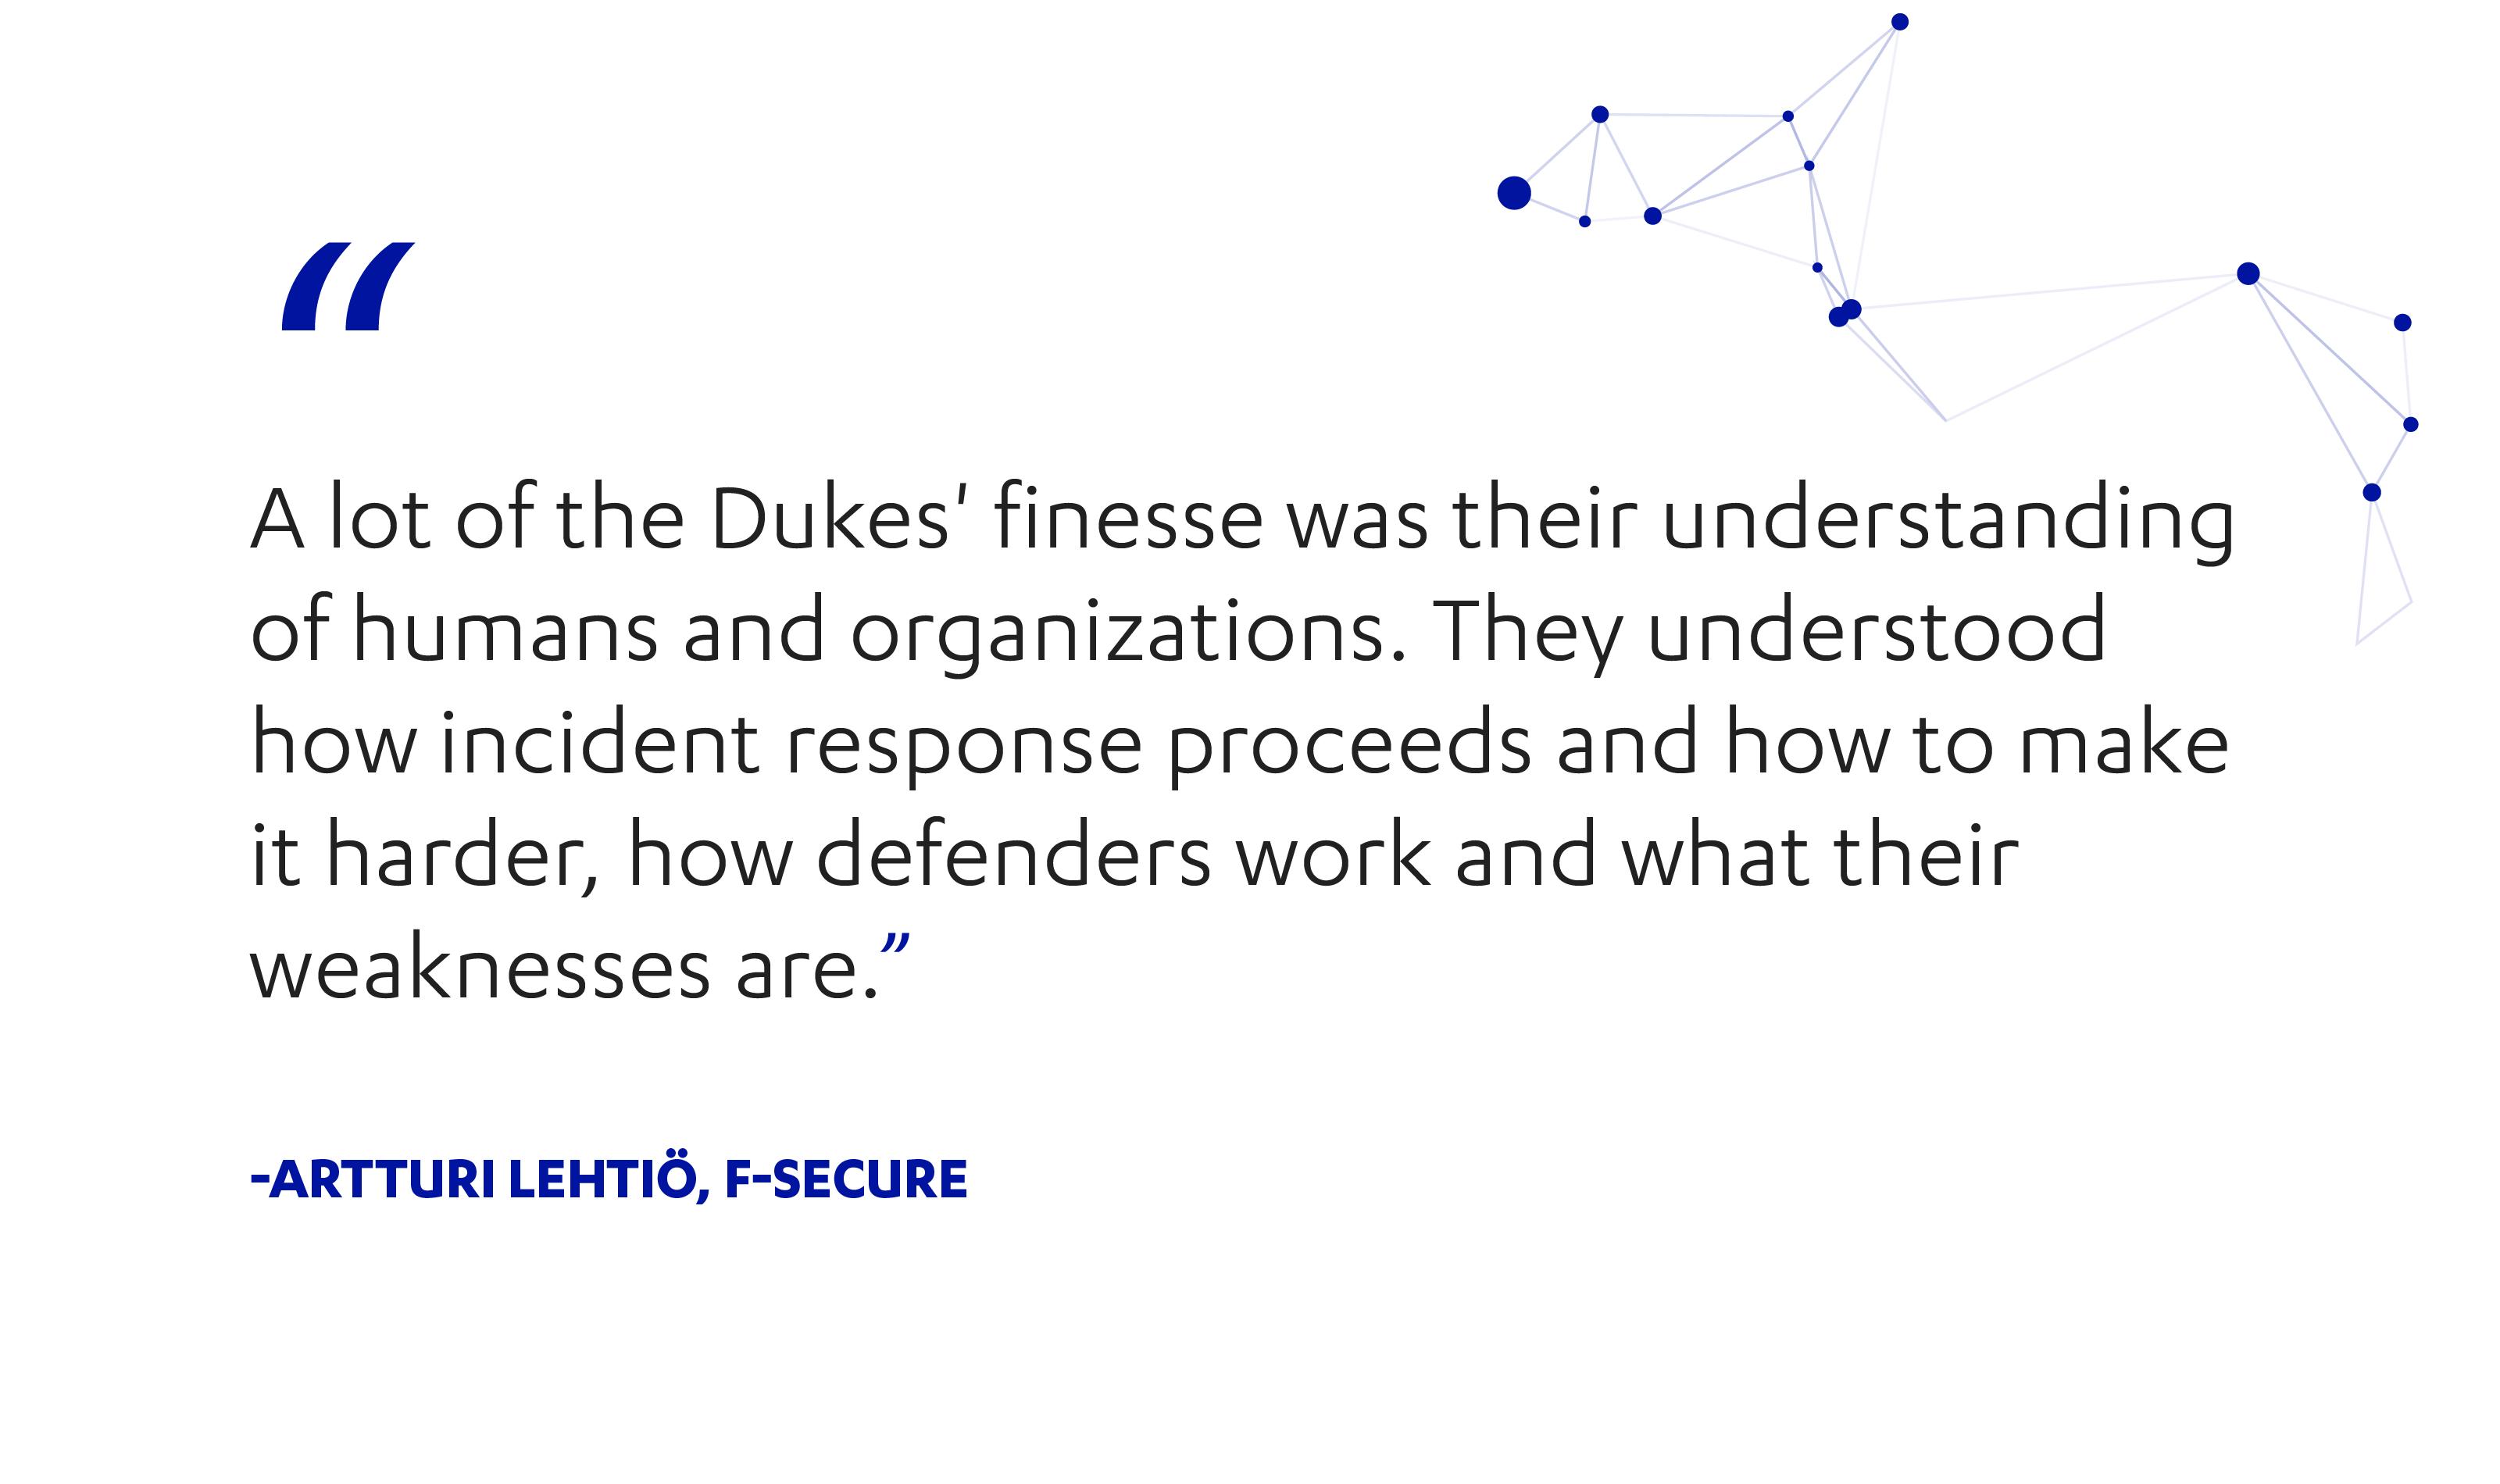 F-Secure's Artturi Lehtio on the finesse of the Dukes